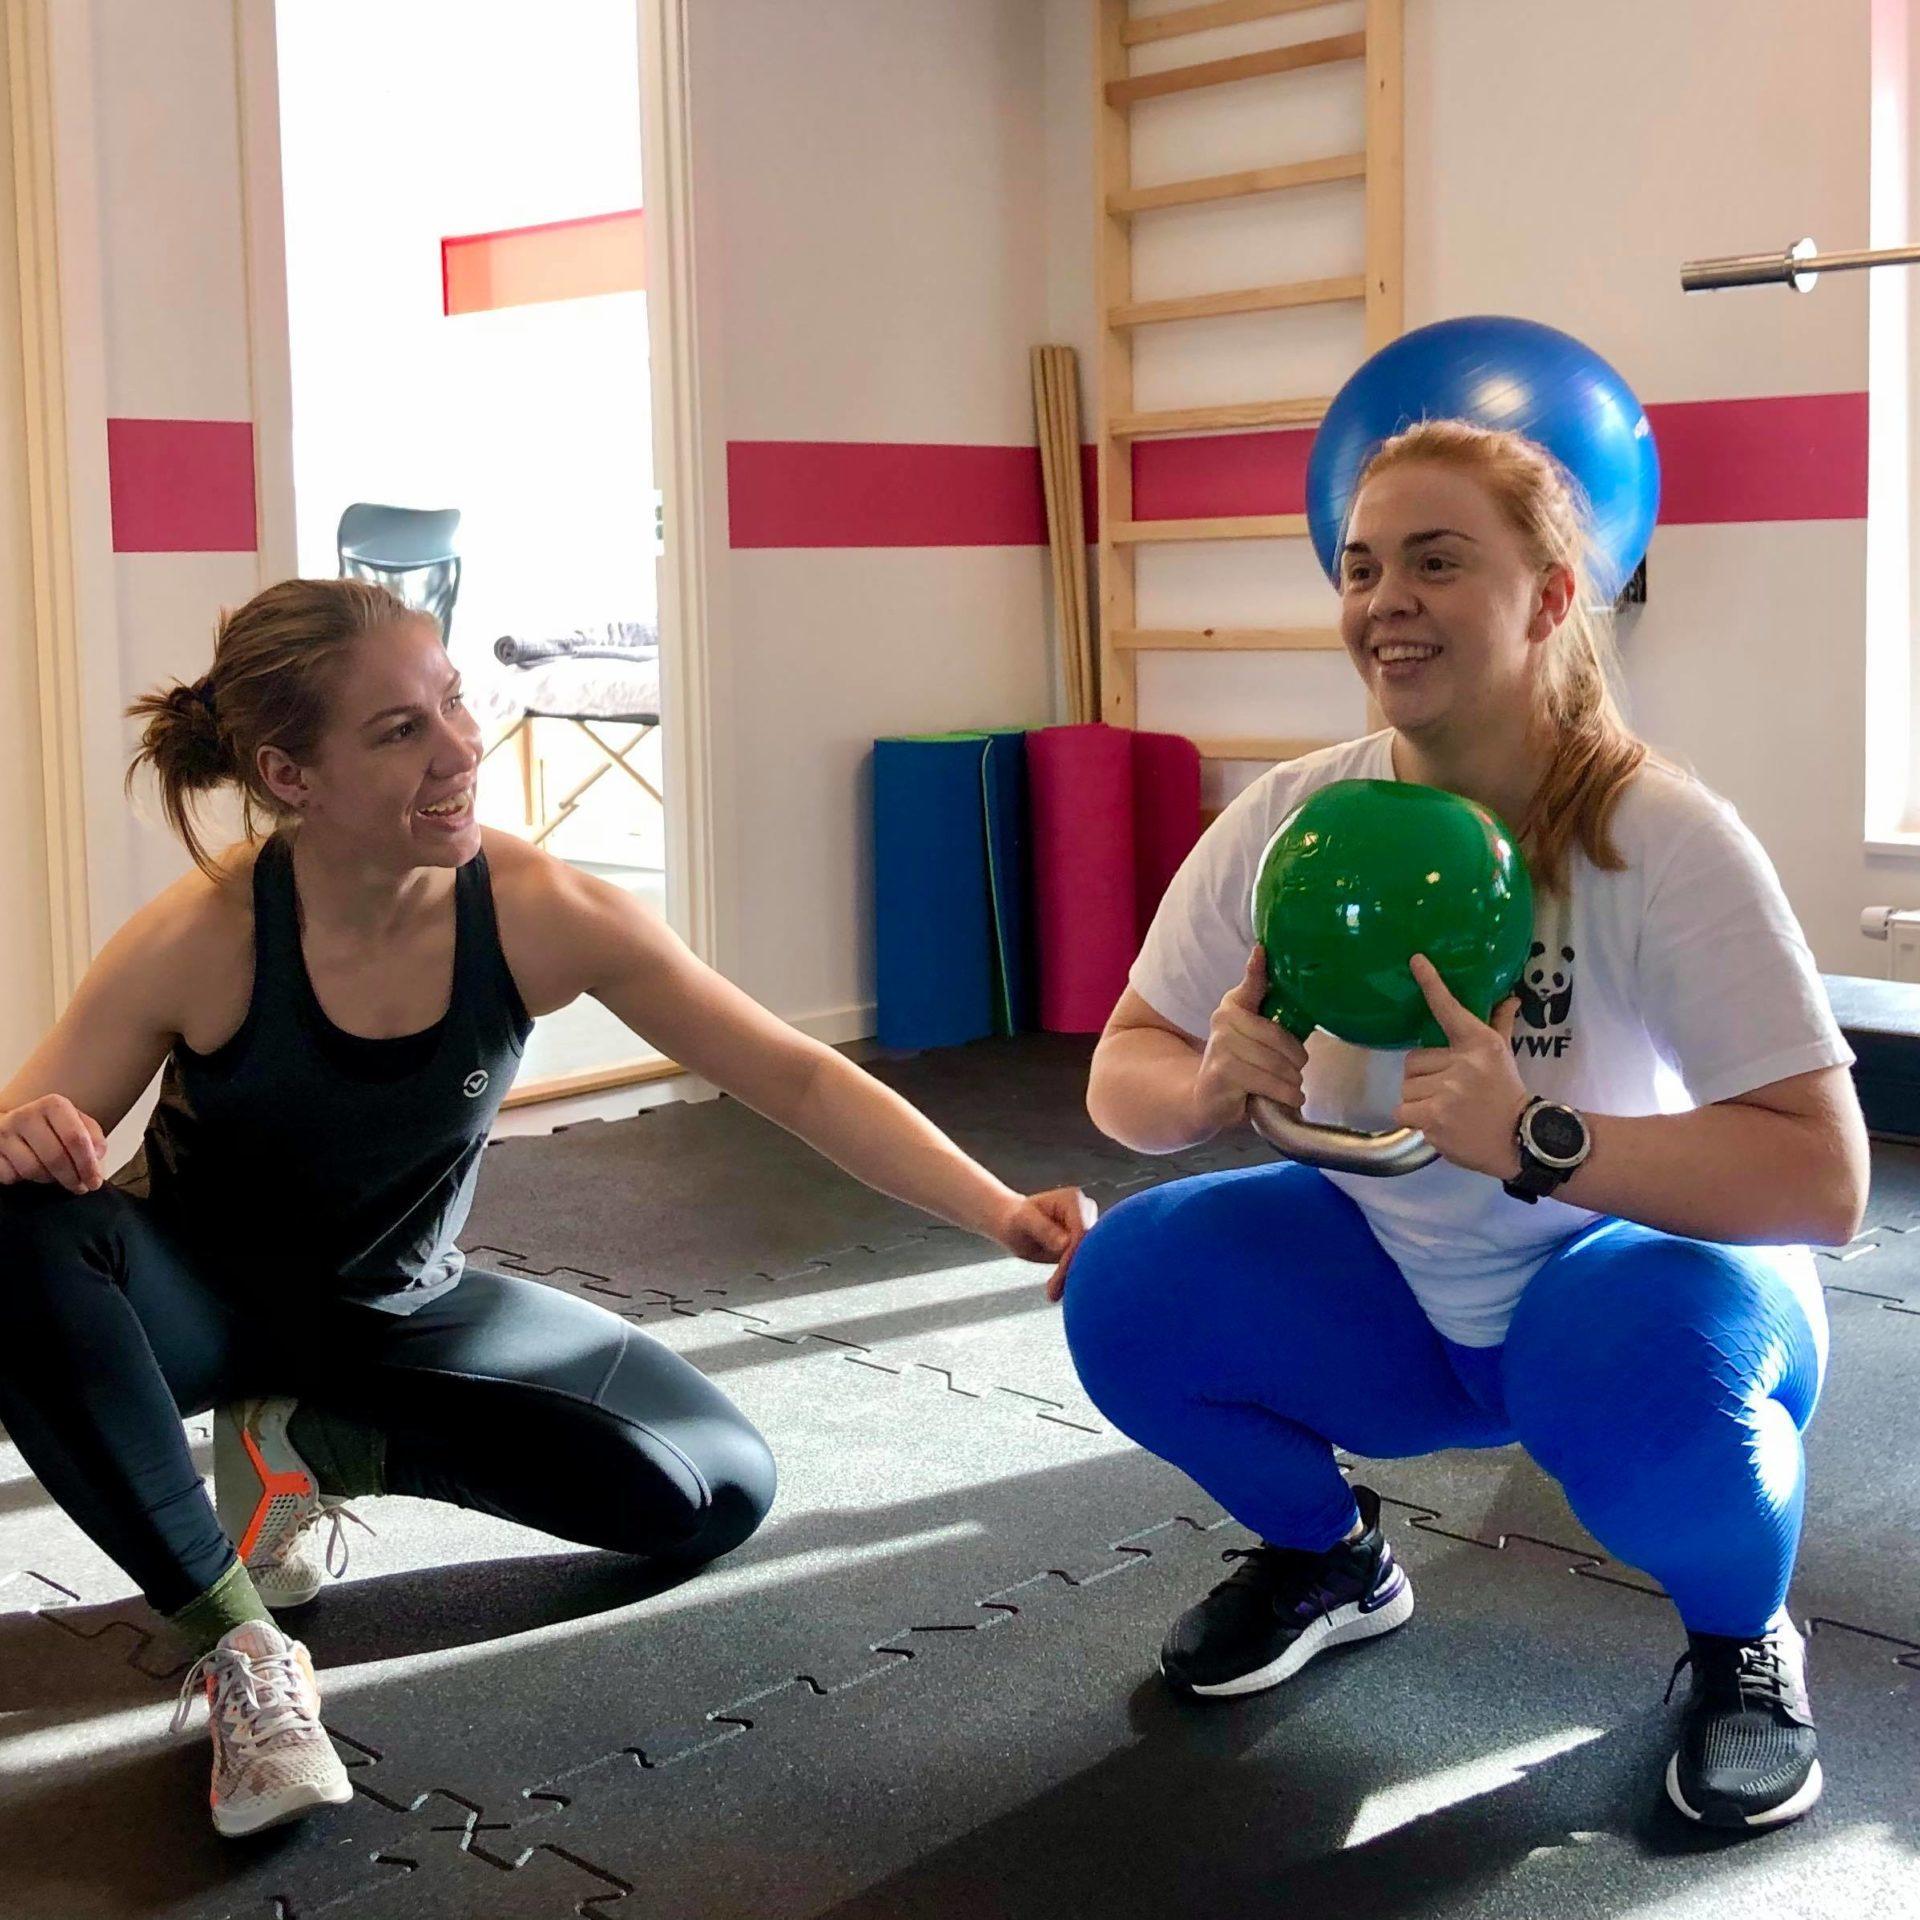 Fysioterapeut Vanløse, Improve Studio, Sofie Ankerstjerne10